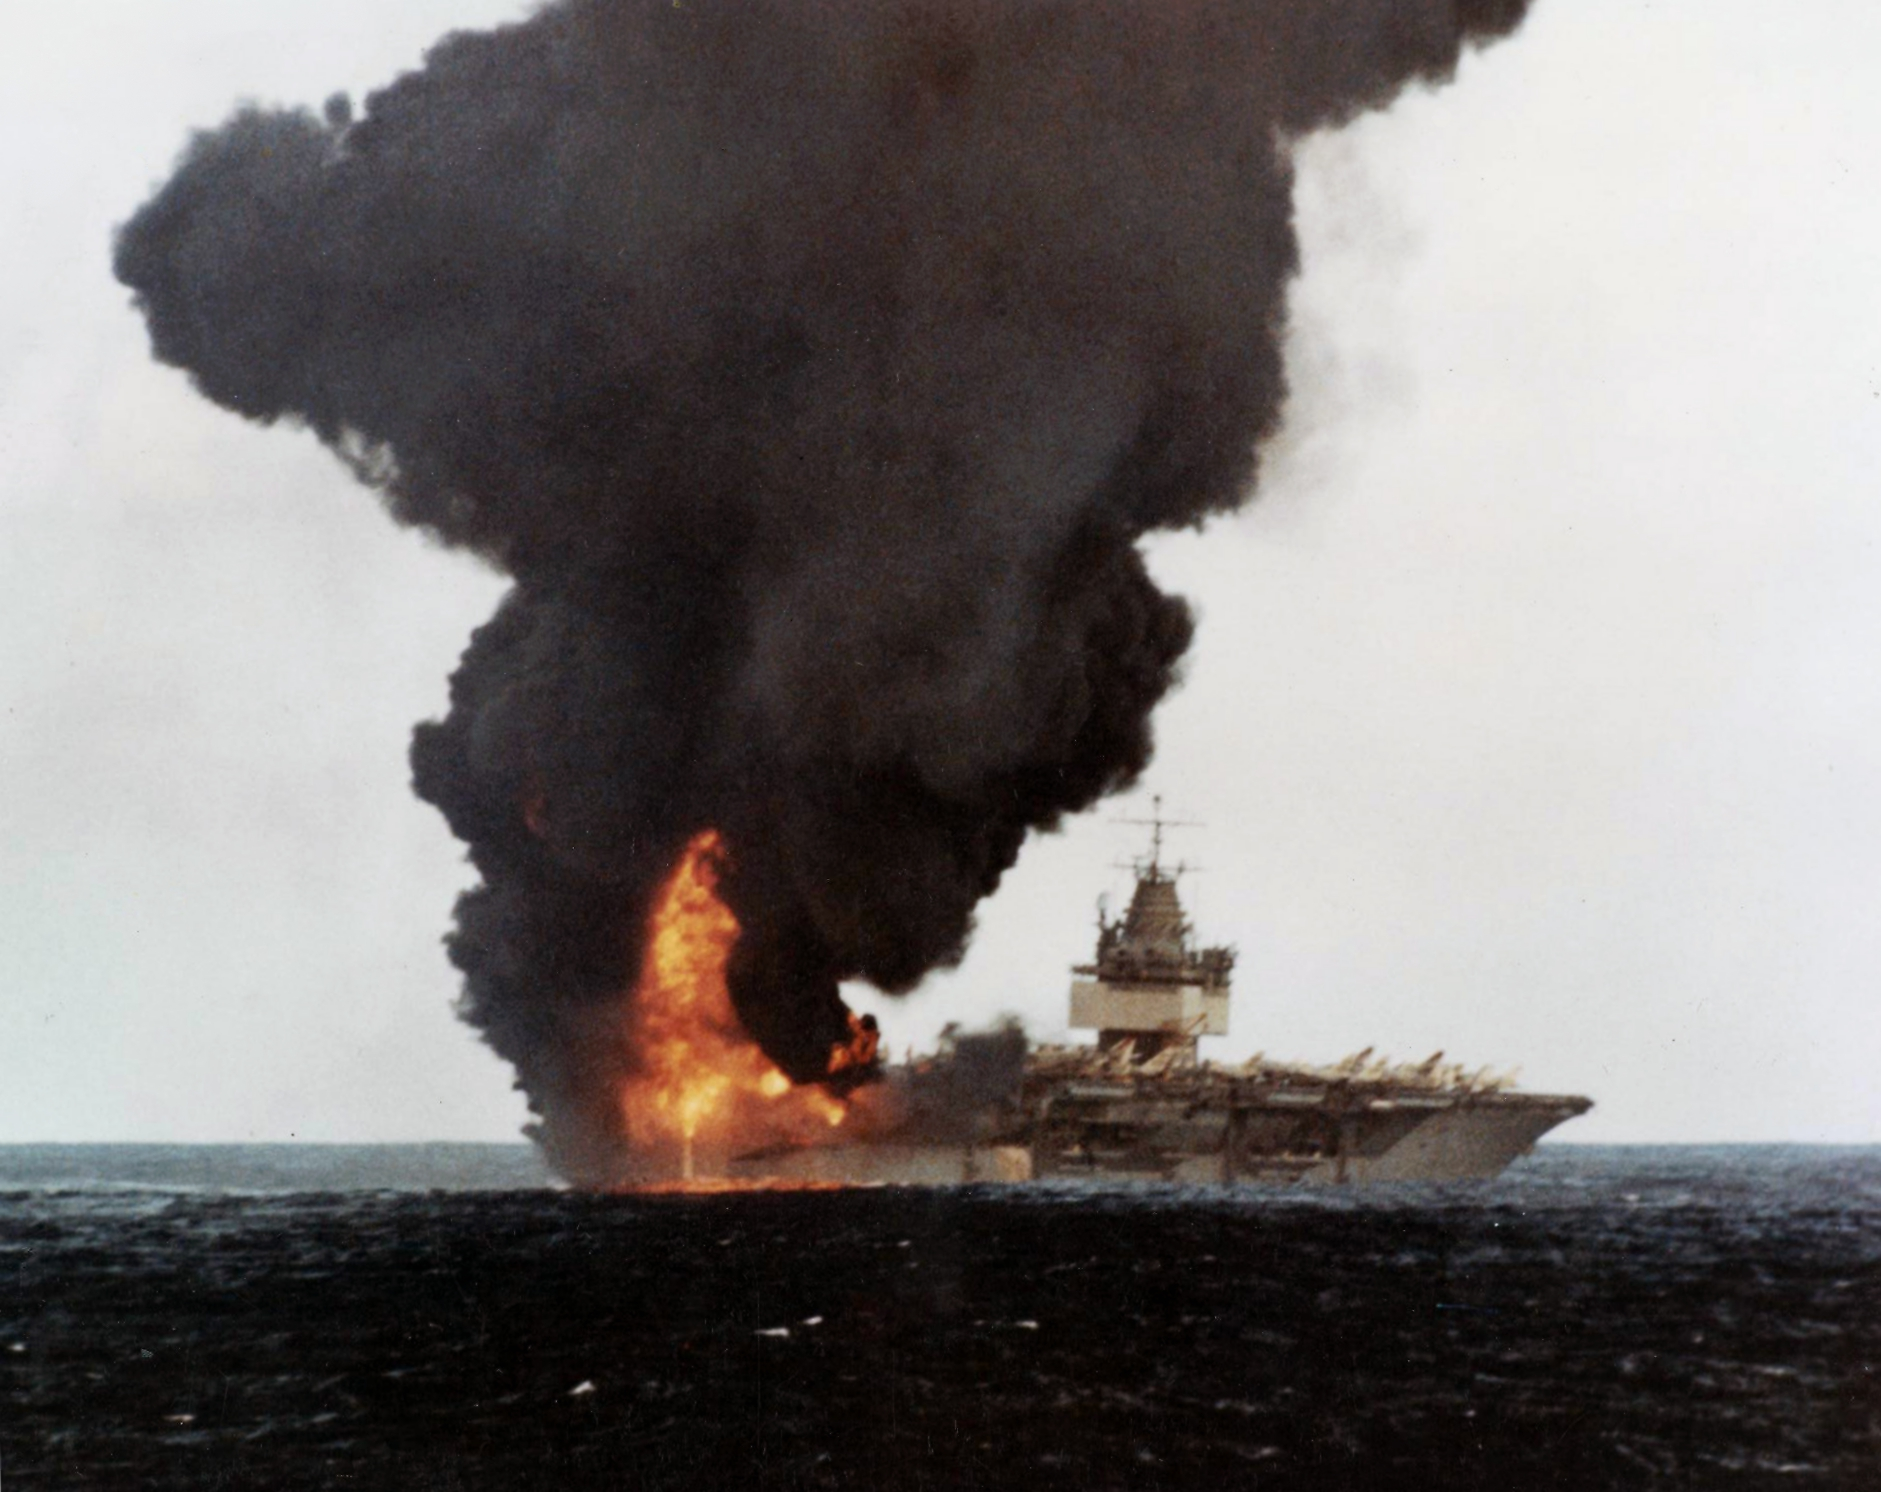 USS_Enterprise_%28CVN-65%29_burning%2C_stern_view.jpg